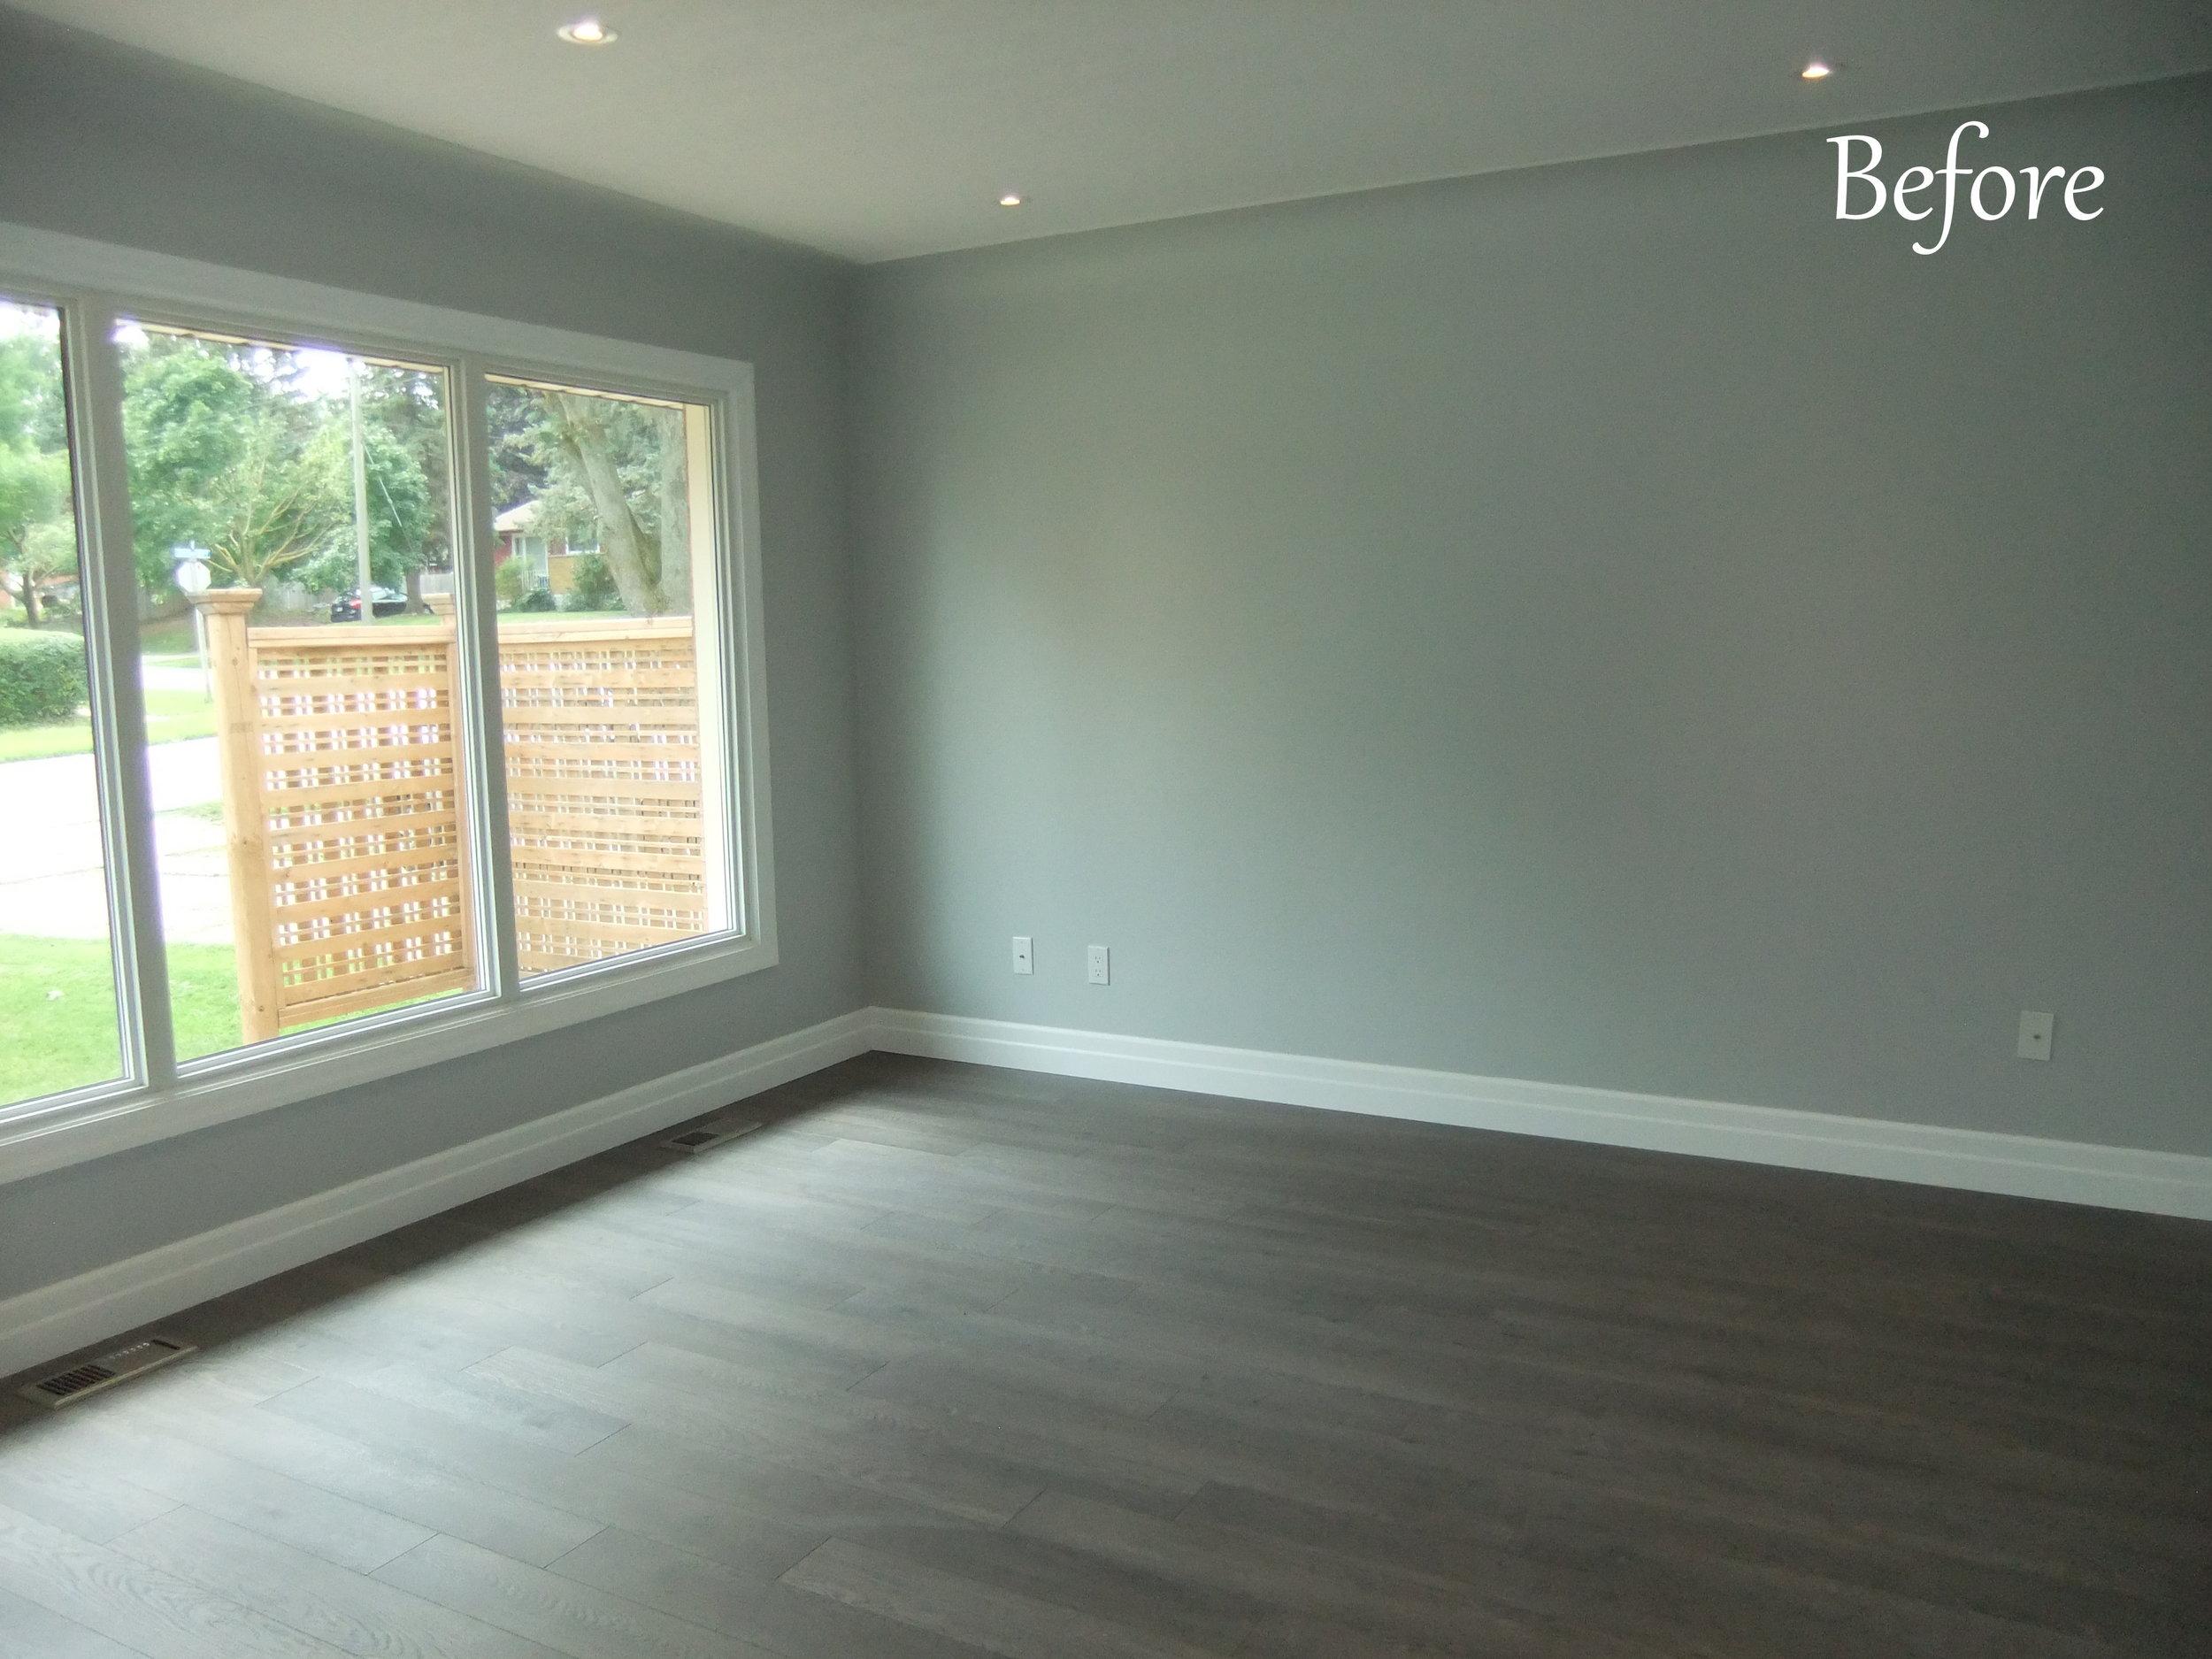 Livingroom 1 - Before 2.jpg